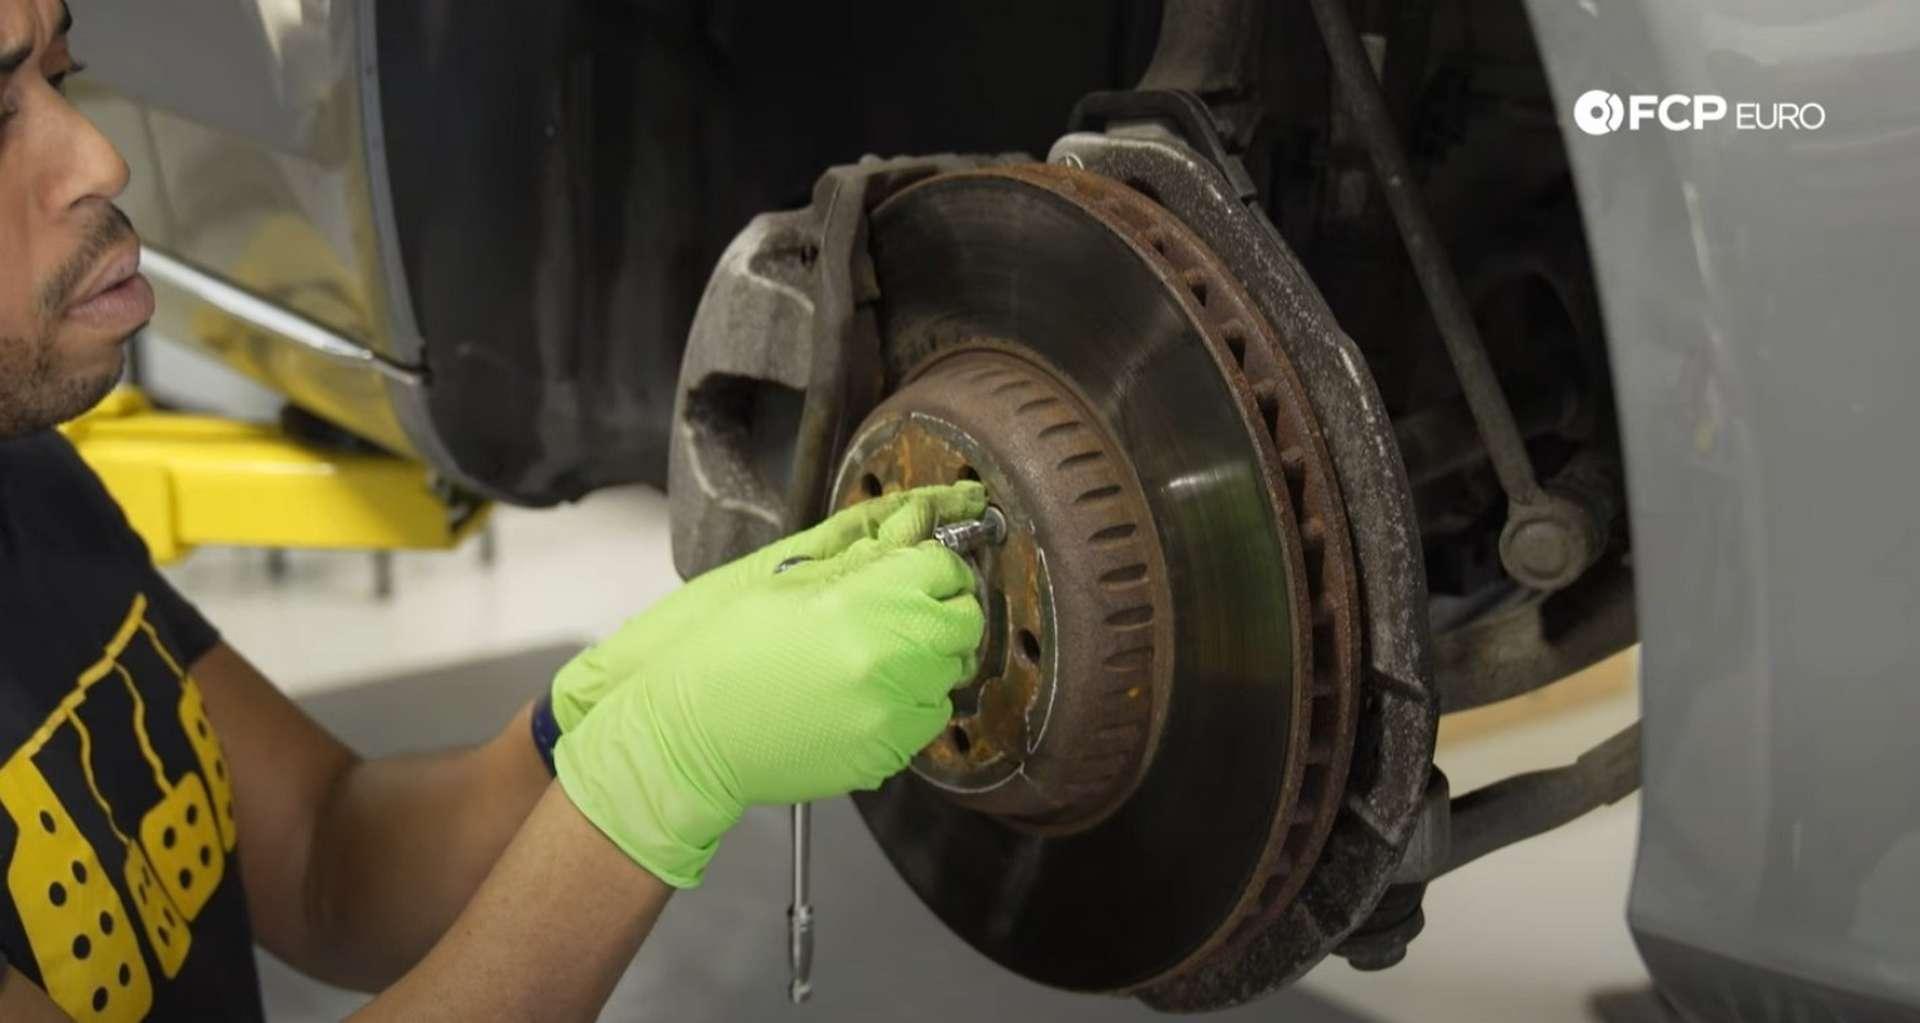 DIY Mercedes-Benz W205 Front Brake Service removing the set screw